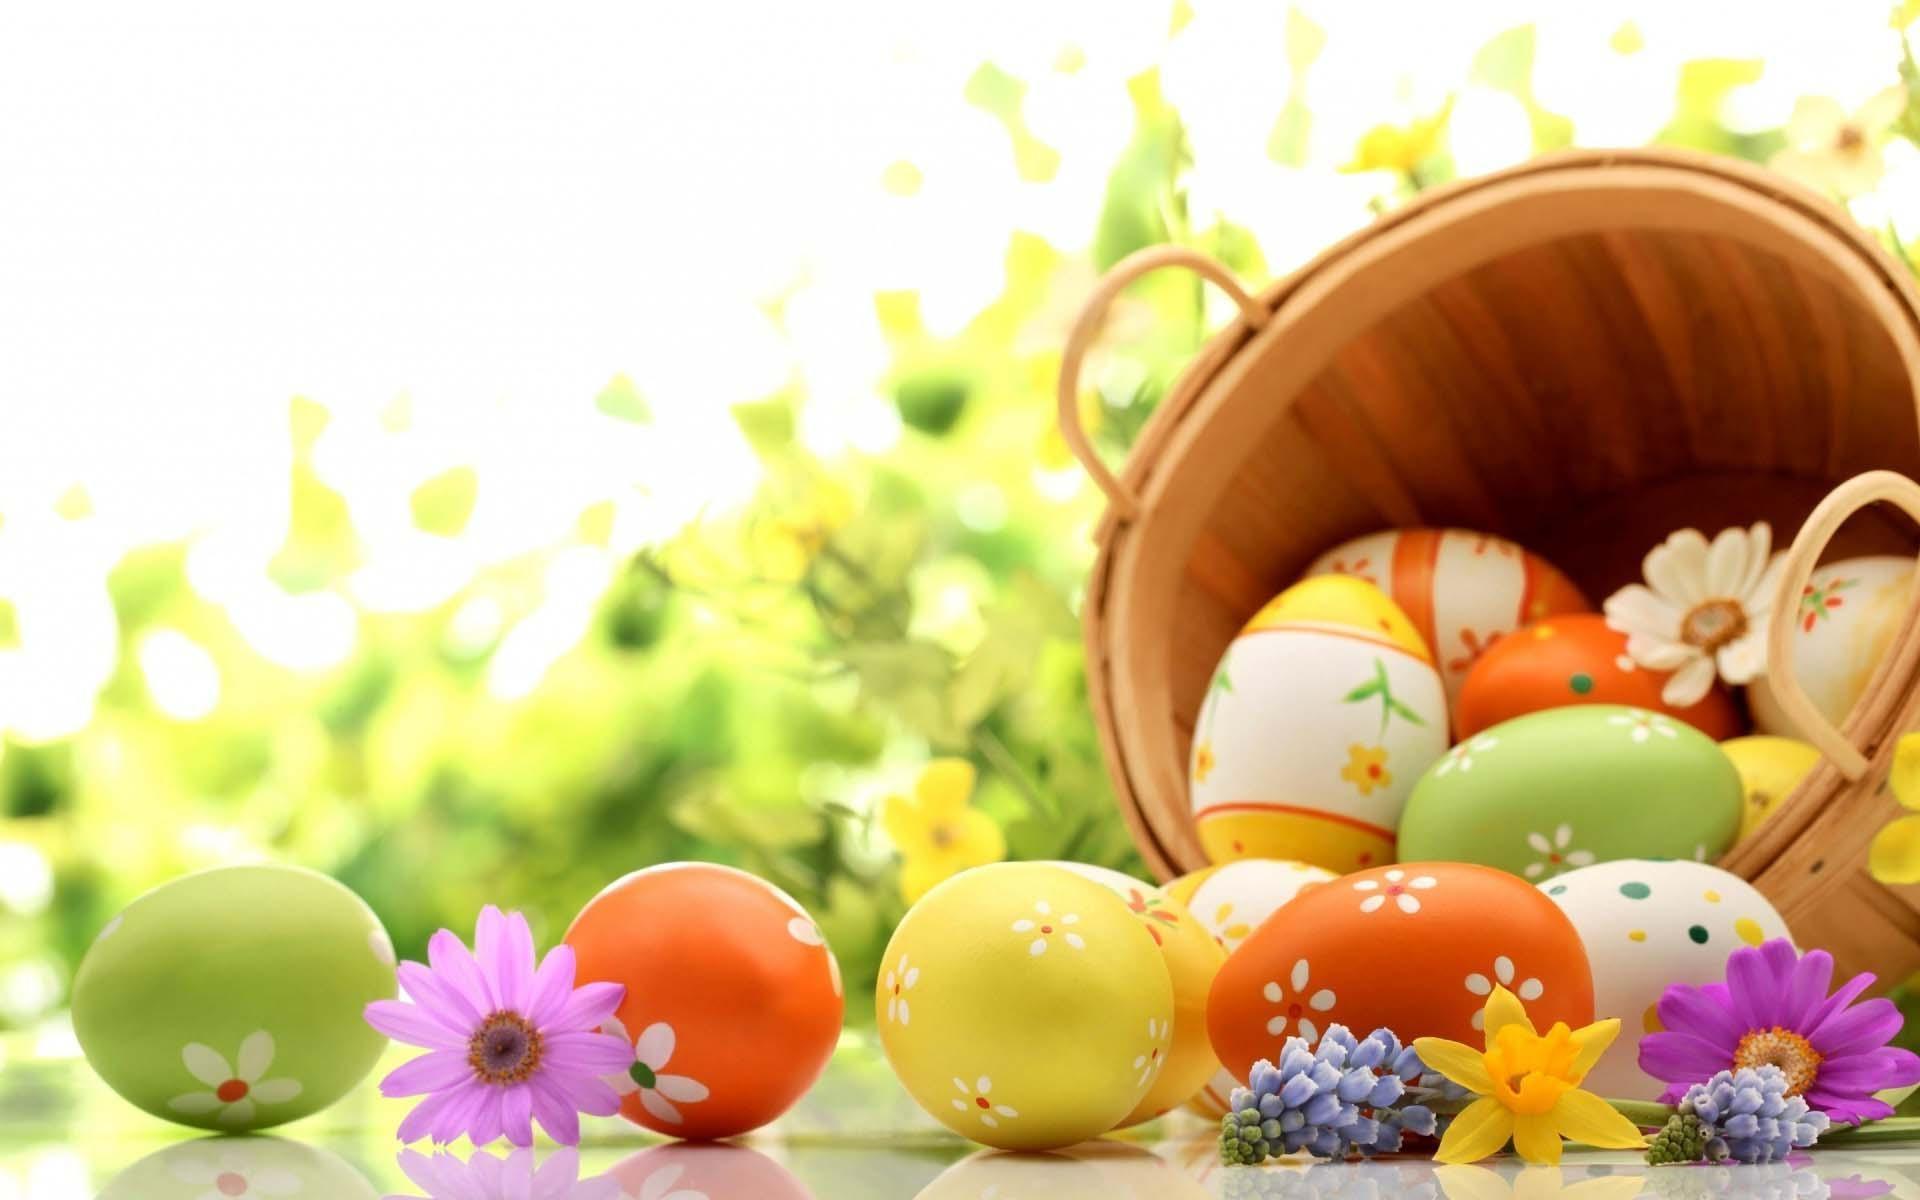 Digital photo Happy Easter jpg screen saver desktop wallpaper Easter ecard